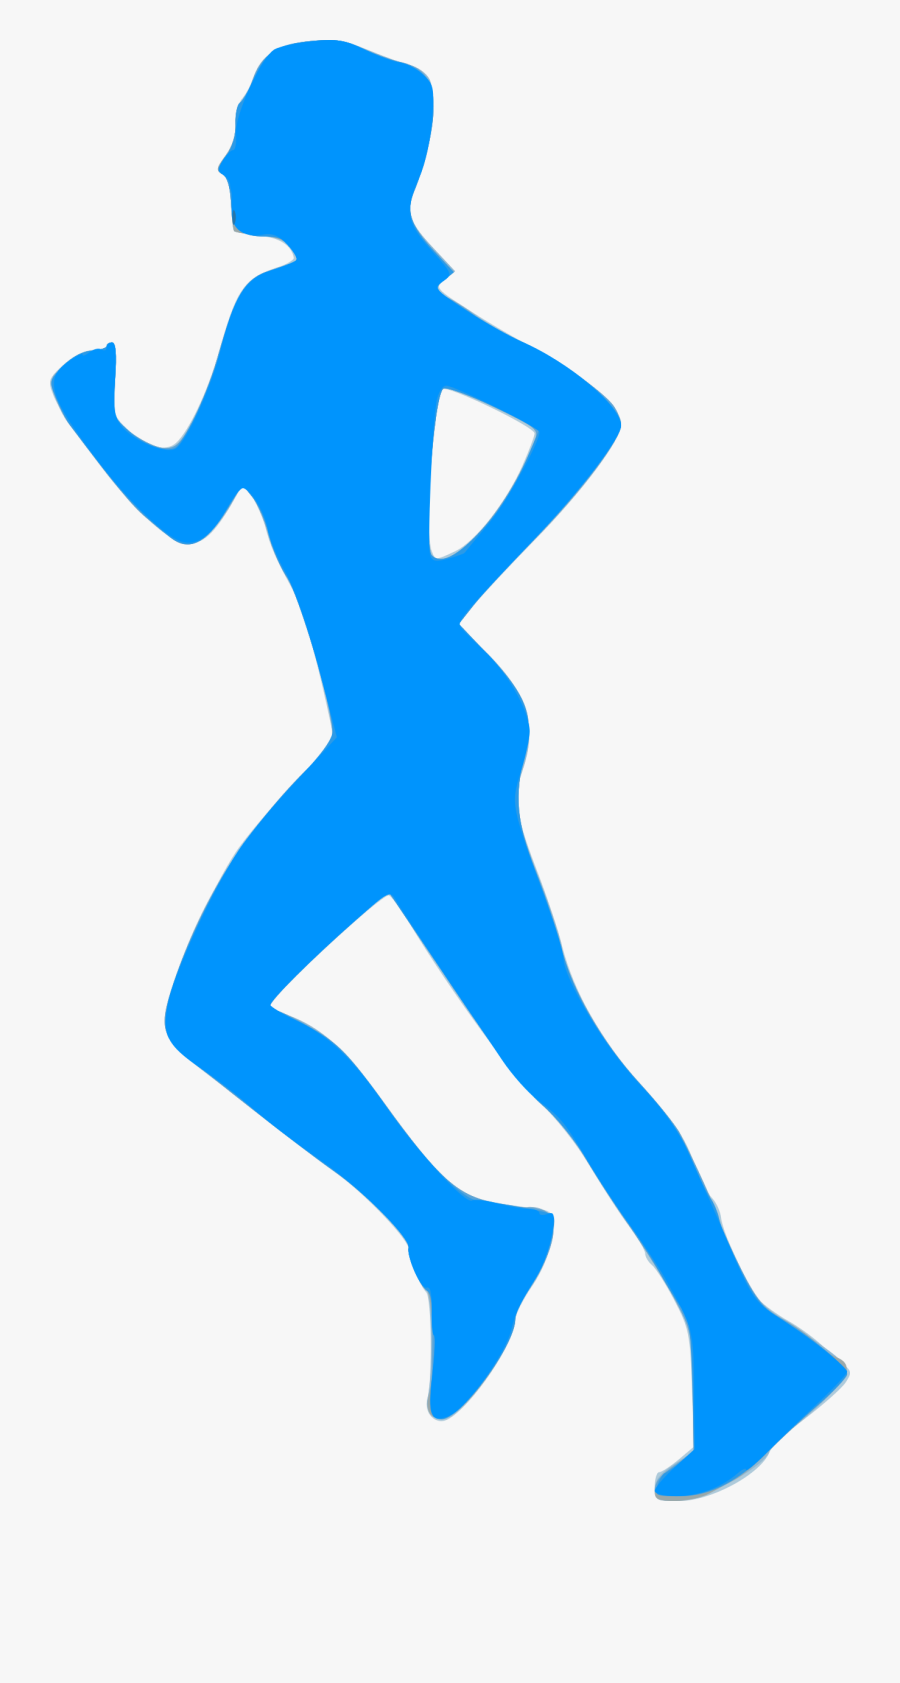 Sports Stoneham Run For Recovery 5k Clip Art Cross - Fitness Girls Blog Logo, Transparent Clipart